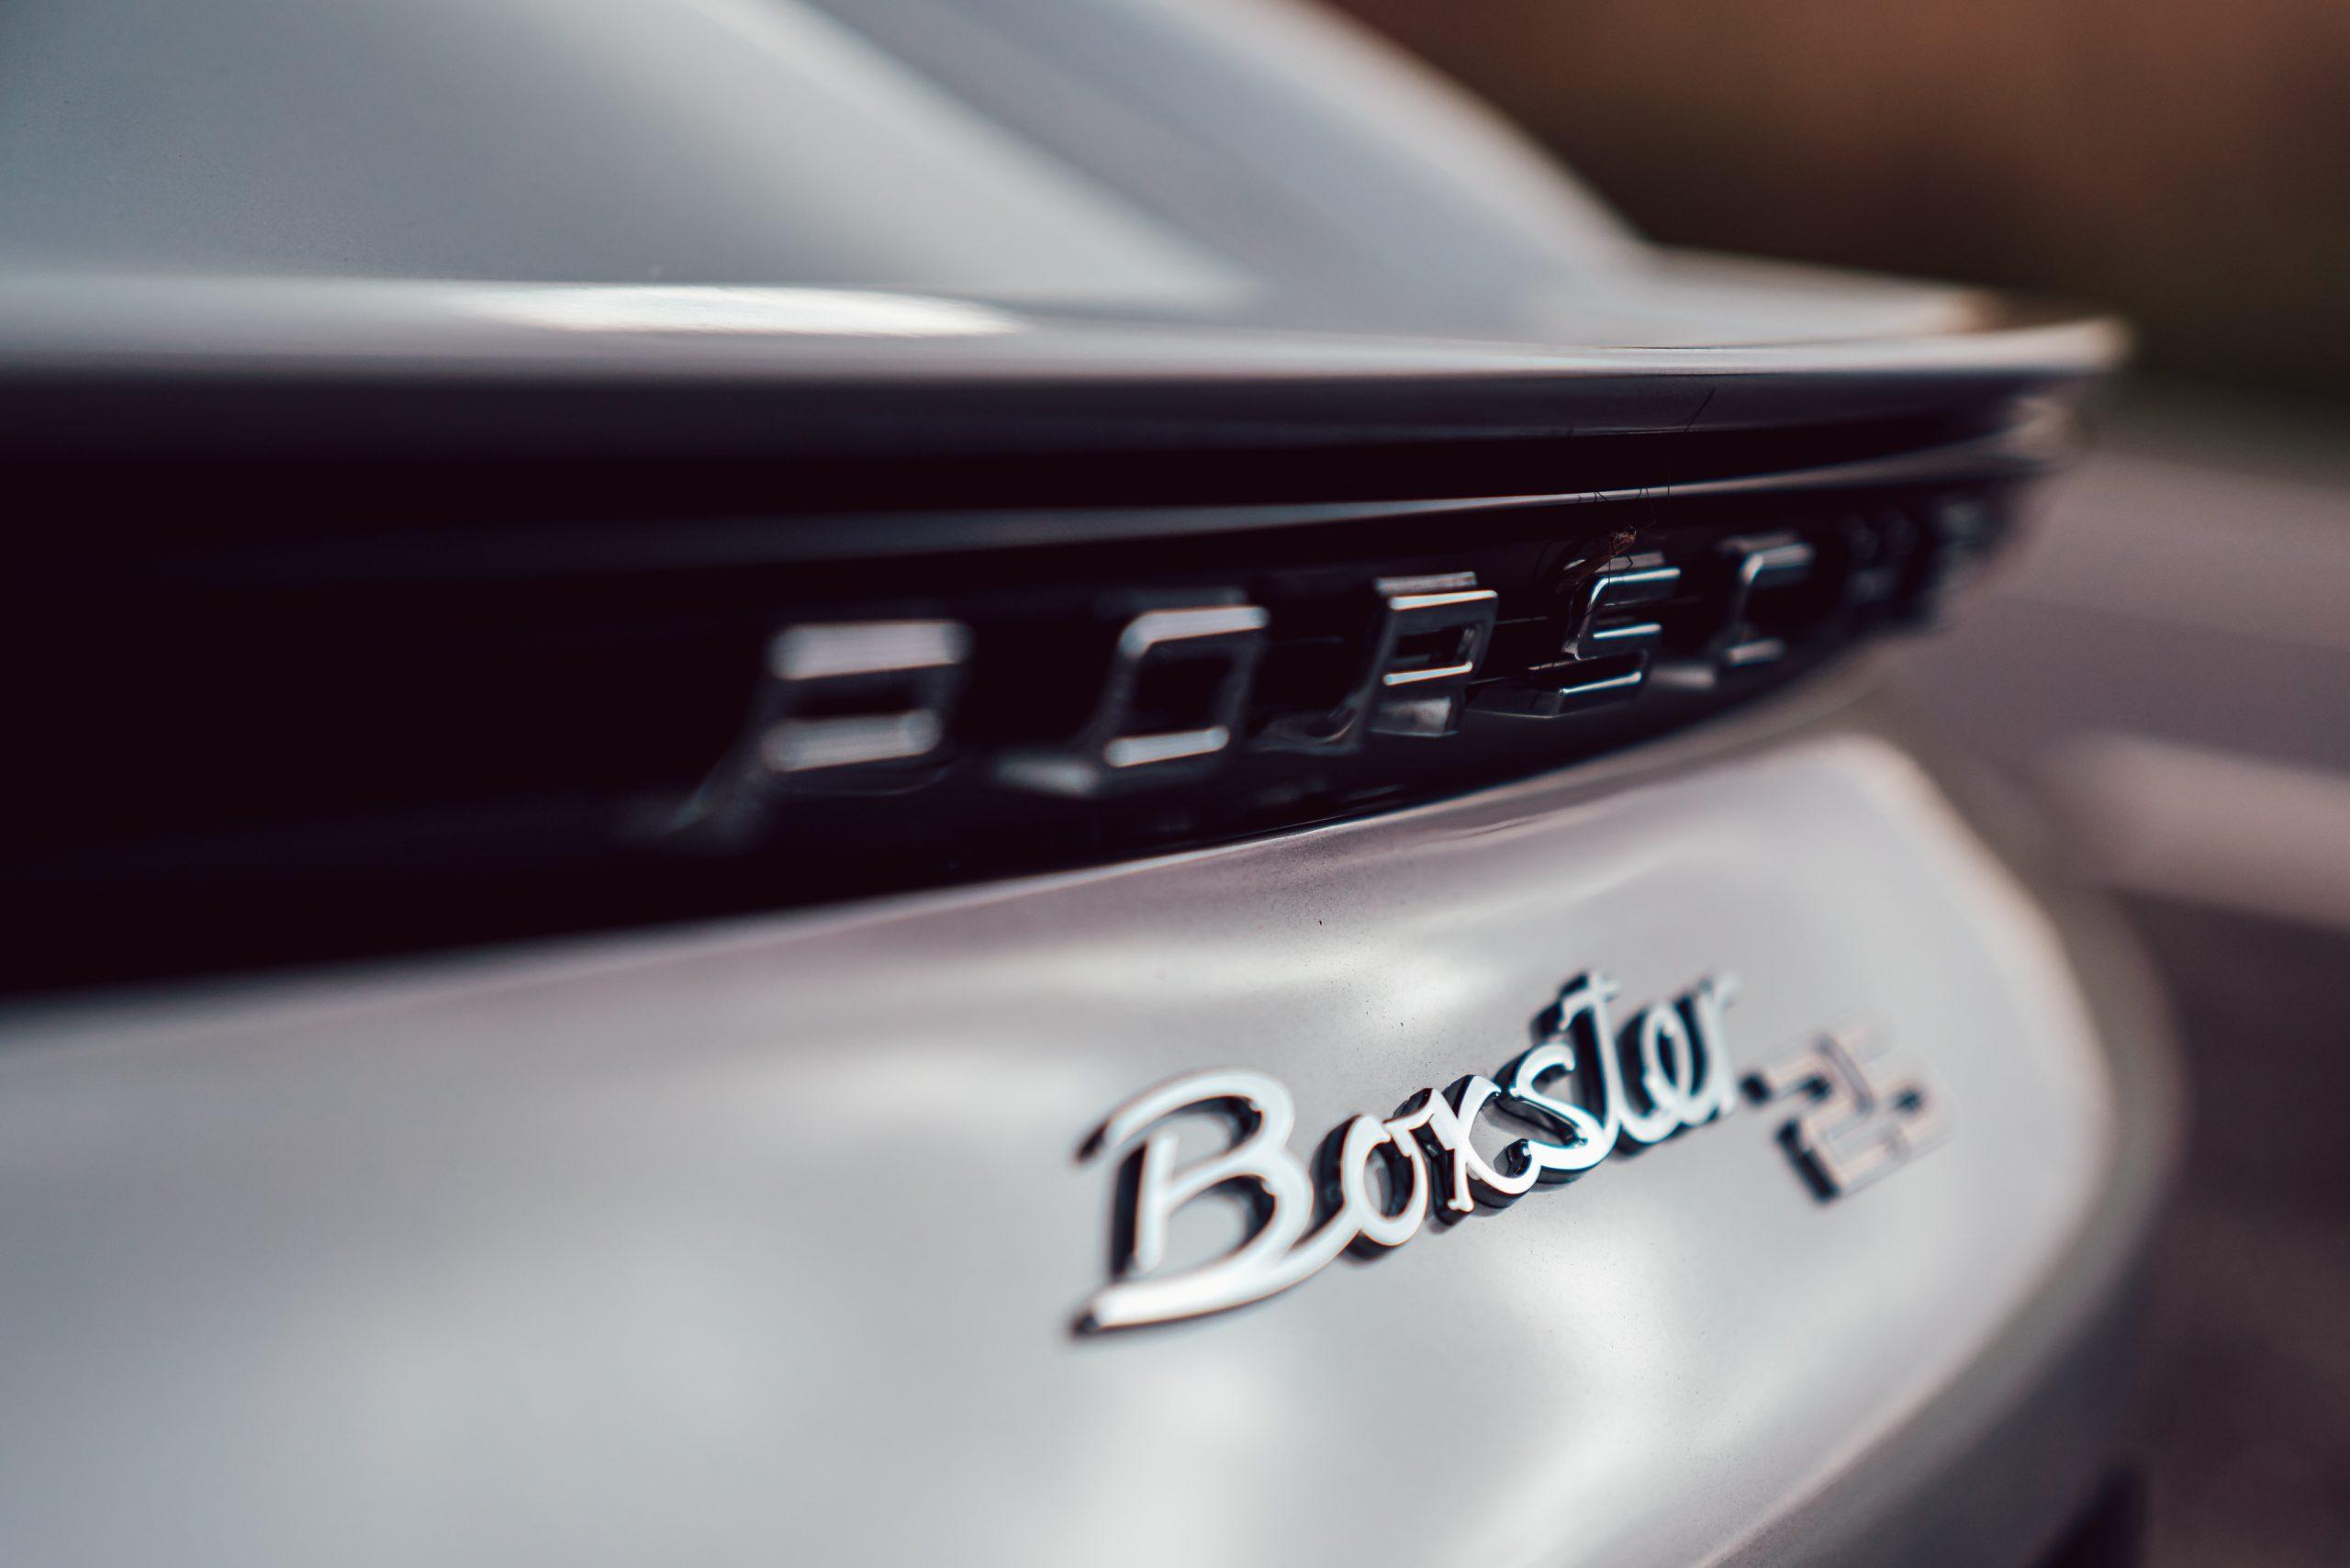 2021 Porsche Boxster 25 Years rear badging